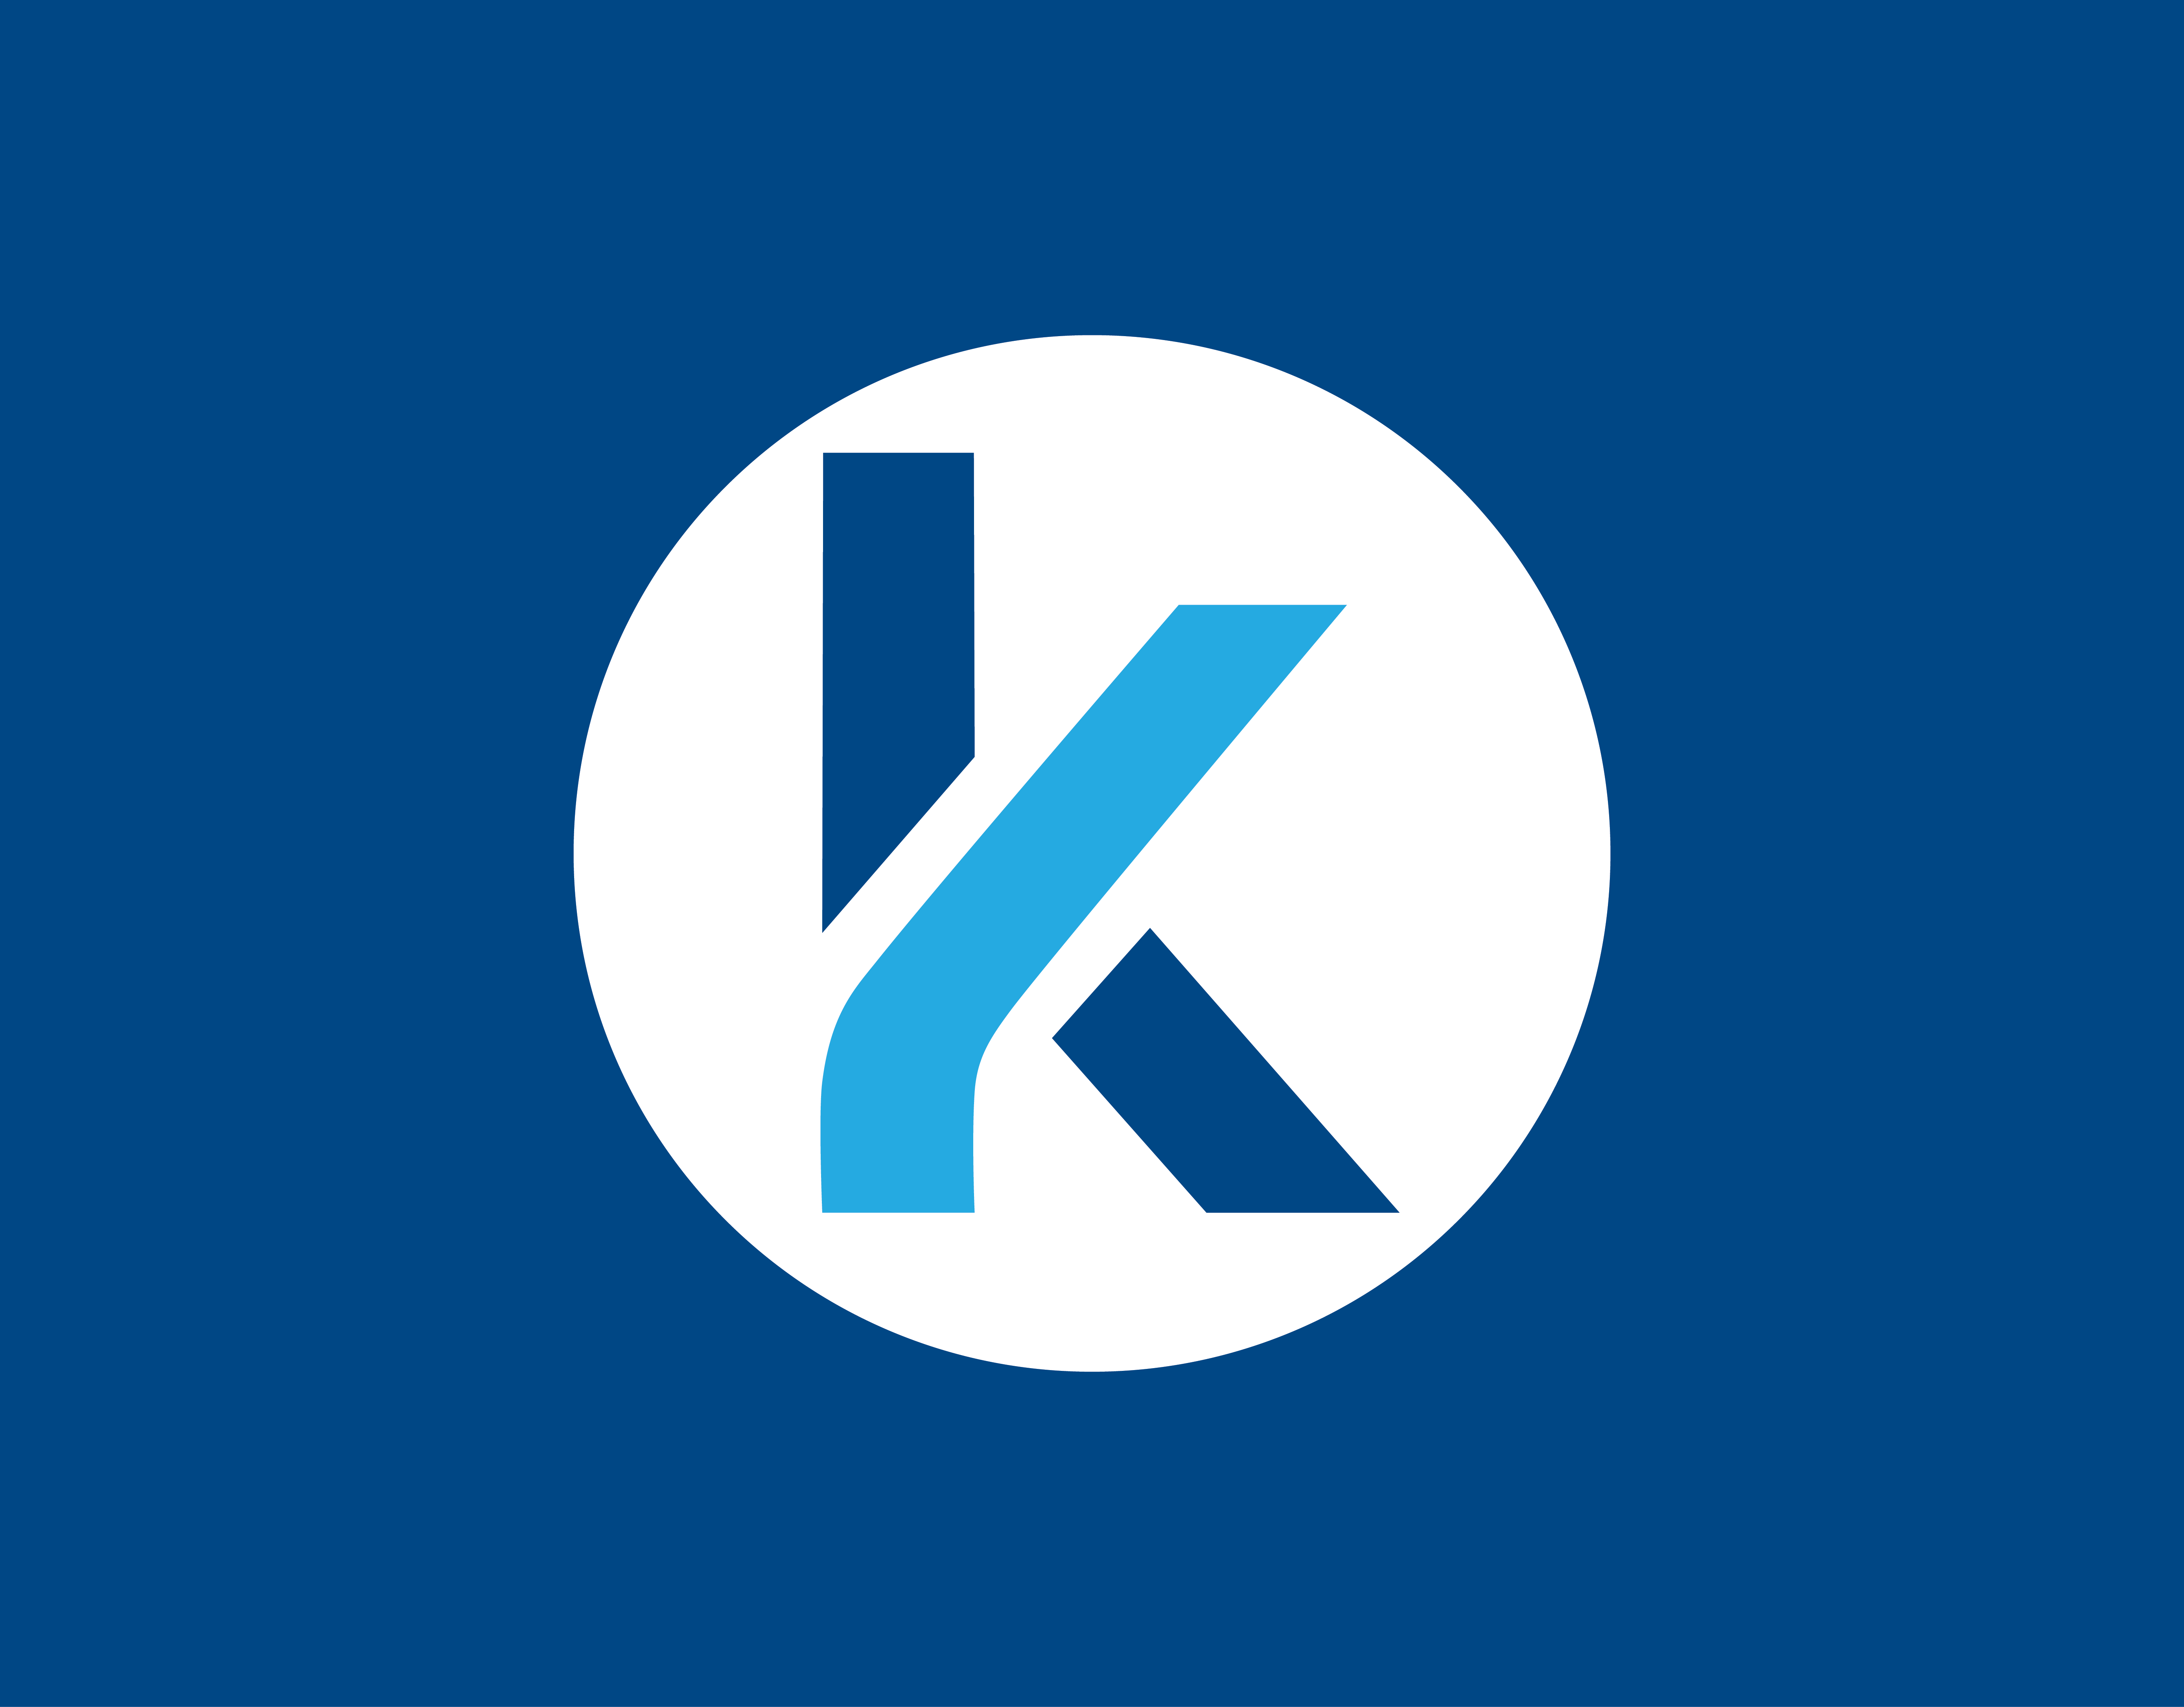 Kenoxa